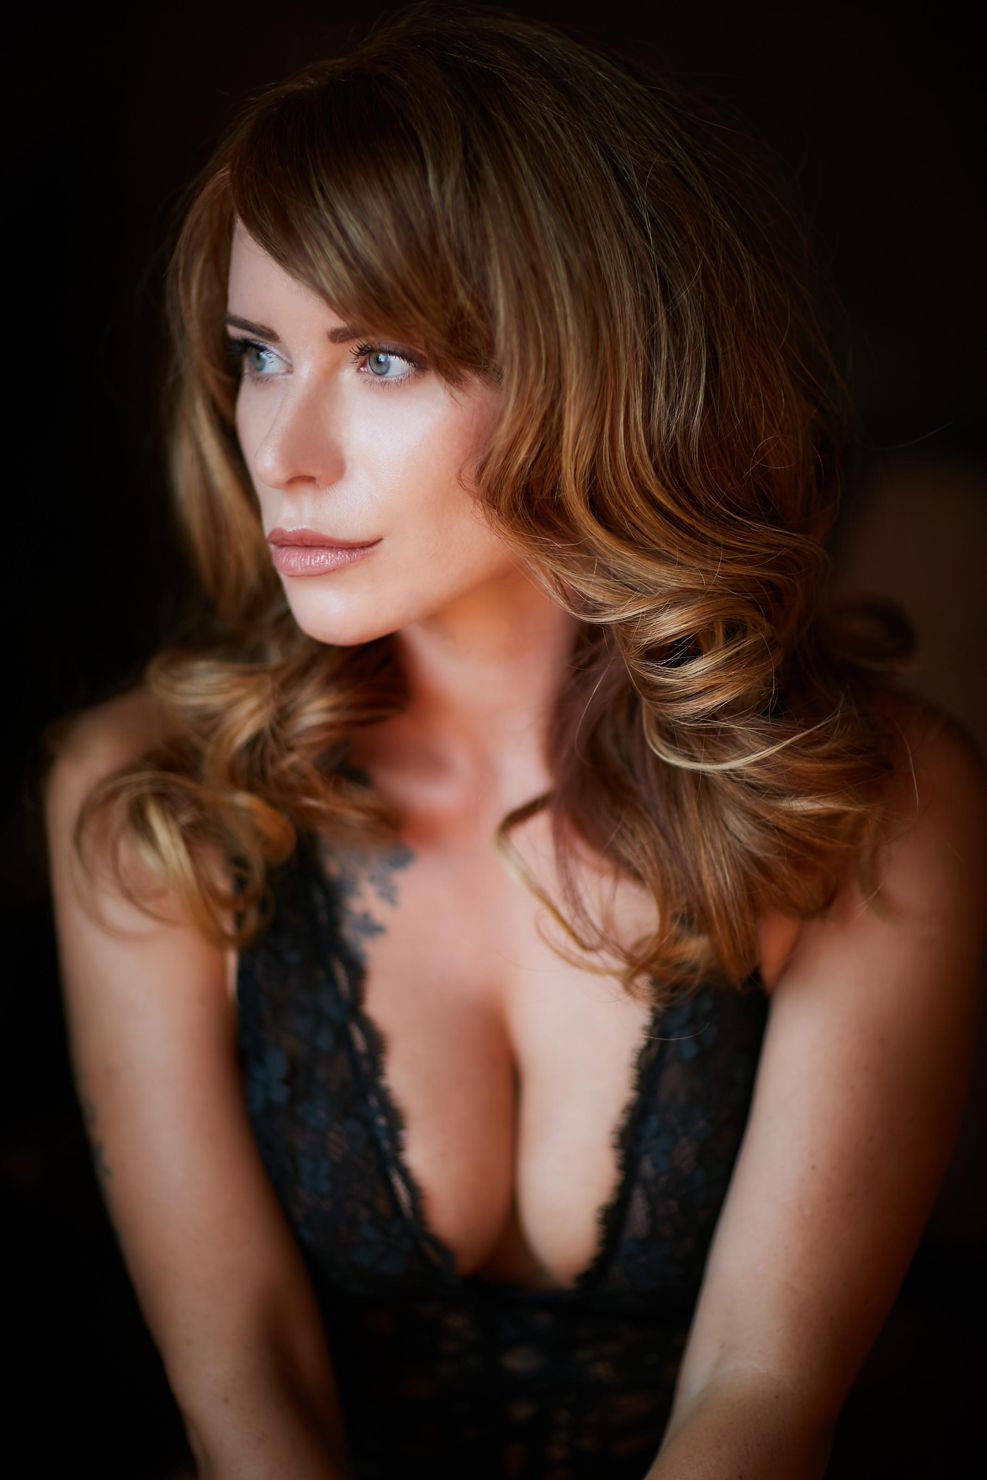 boudoir photography chicago classy - Listing E